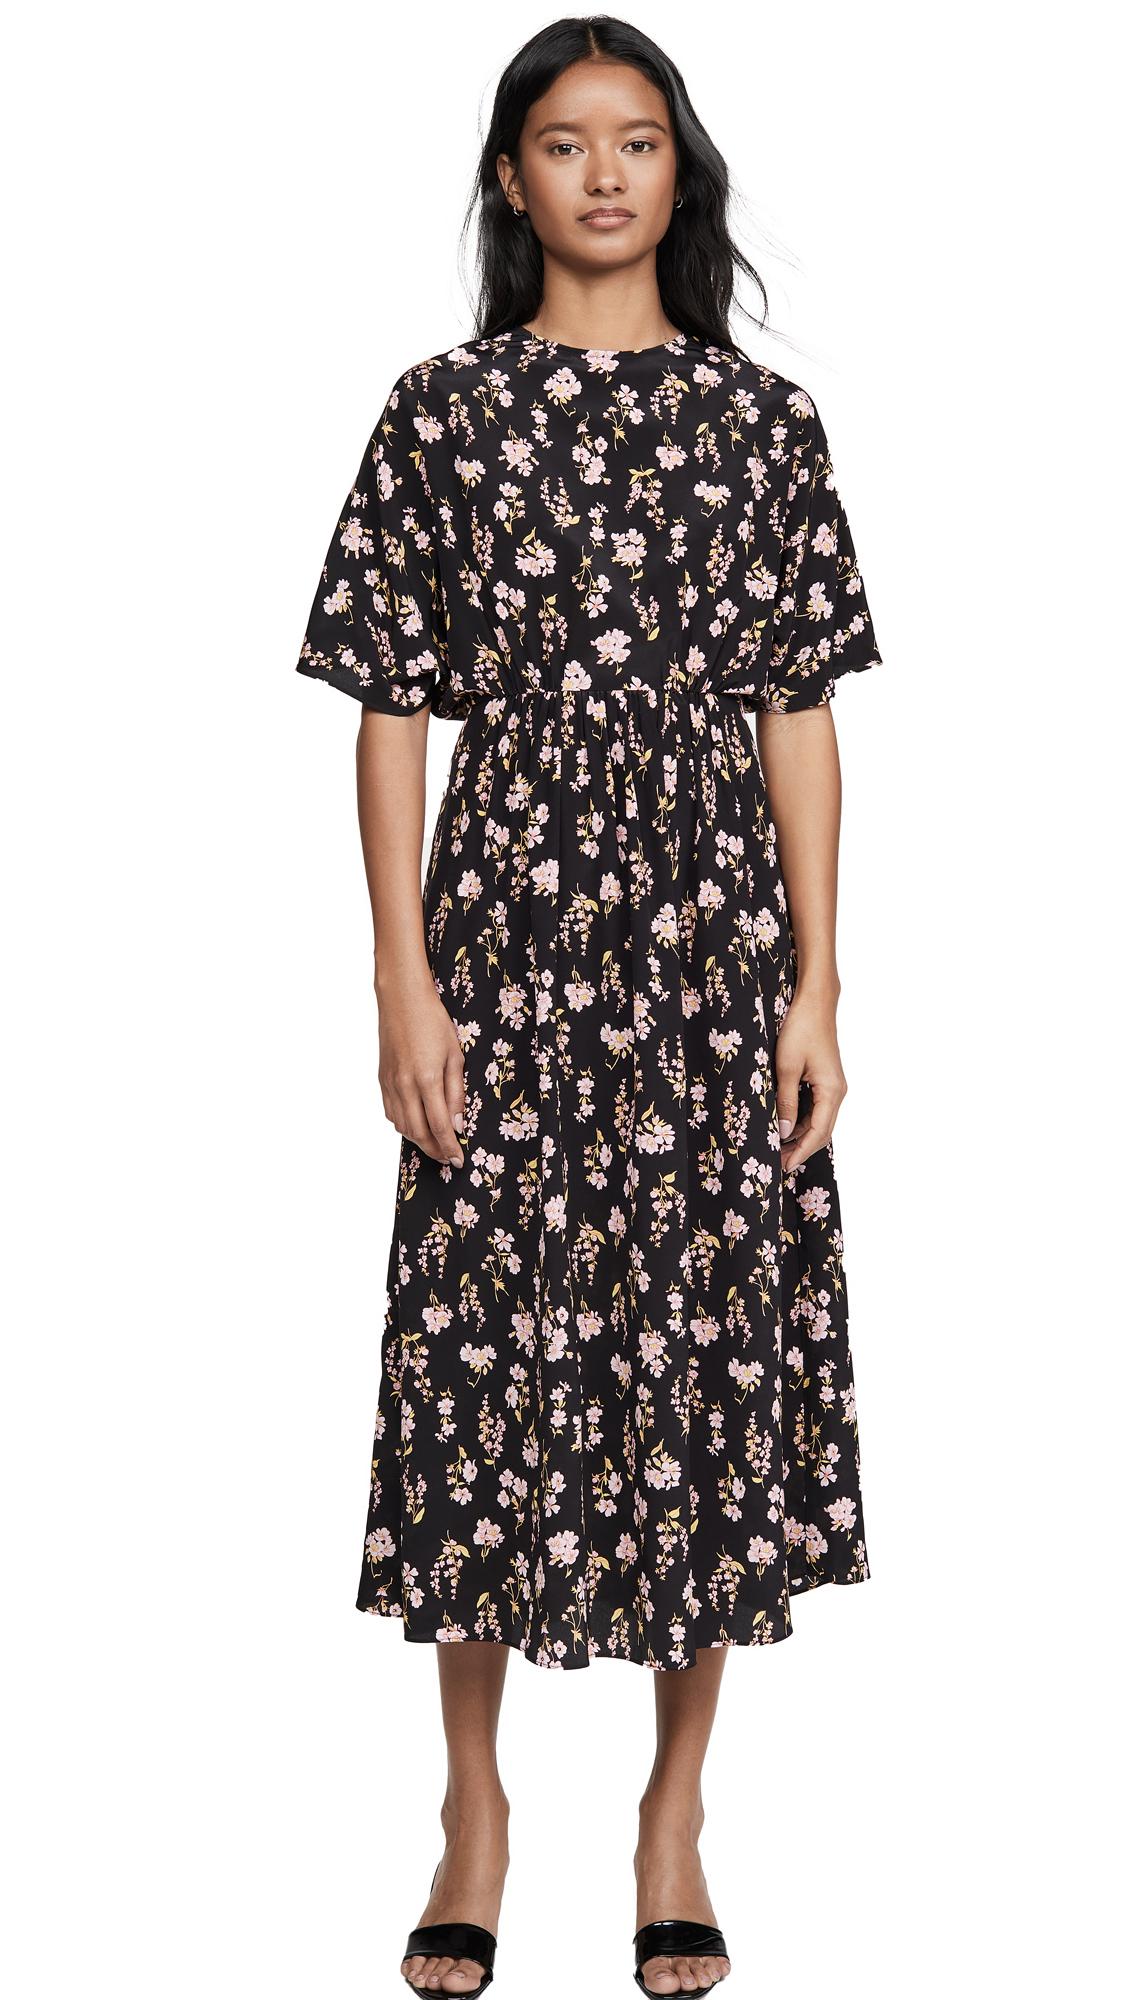 LES REVERIES Circular Sleeve V-Back Dress - 50% Off Sale